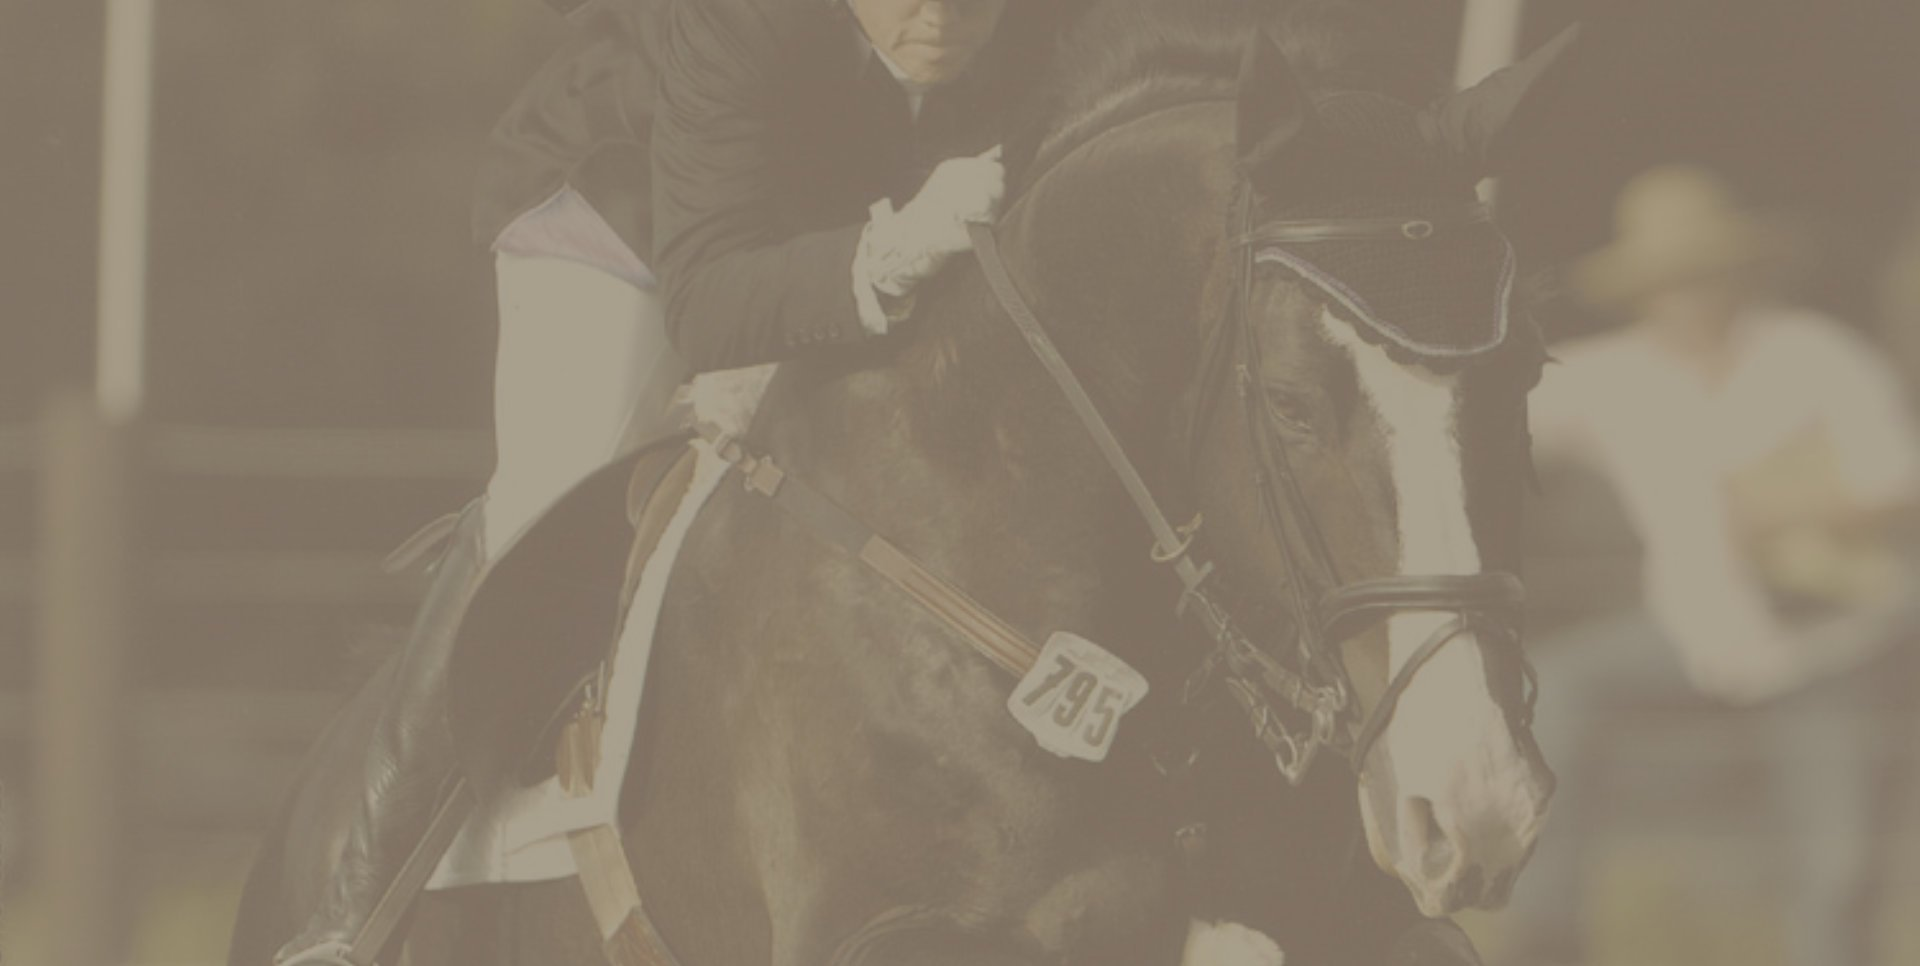 Equestrian header image